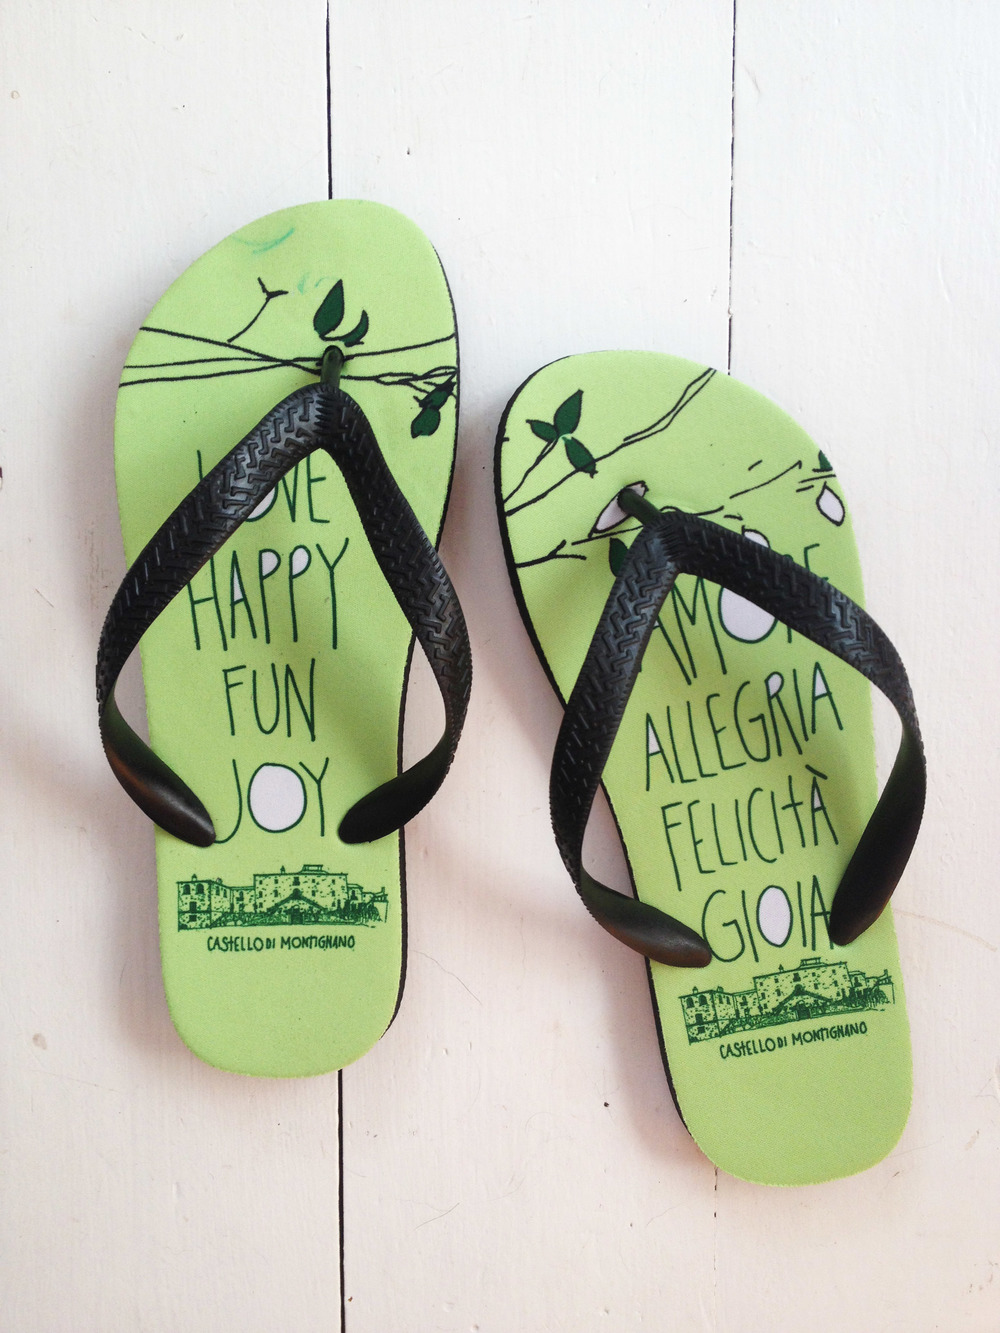 Andrew & Chiara flip flops!